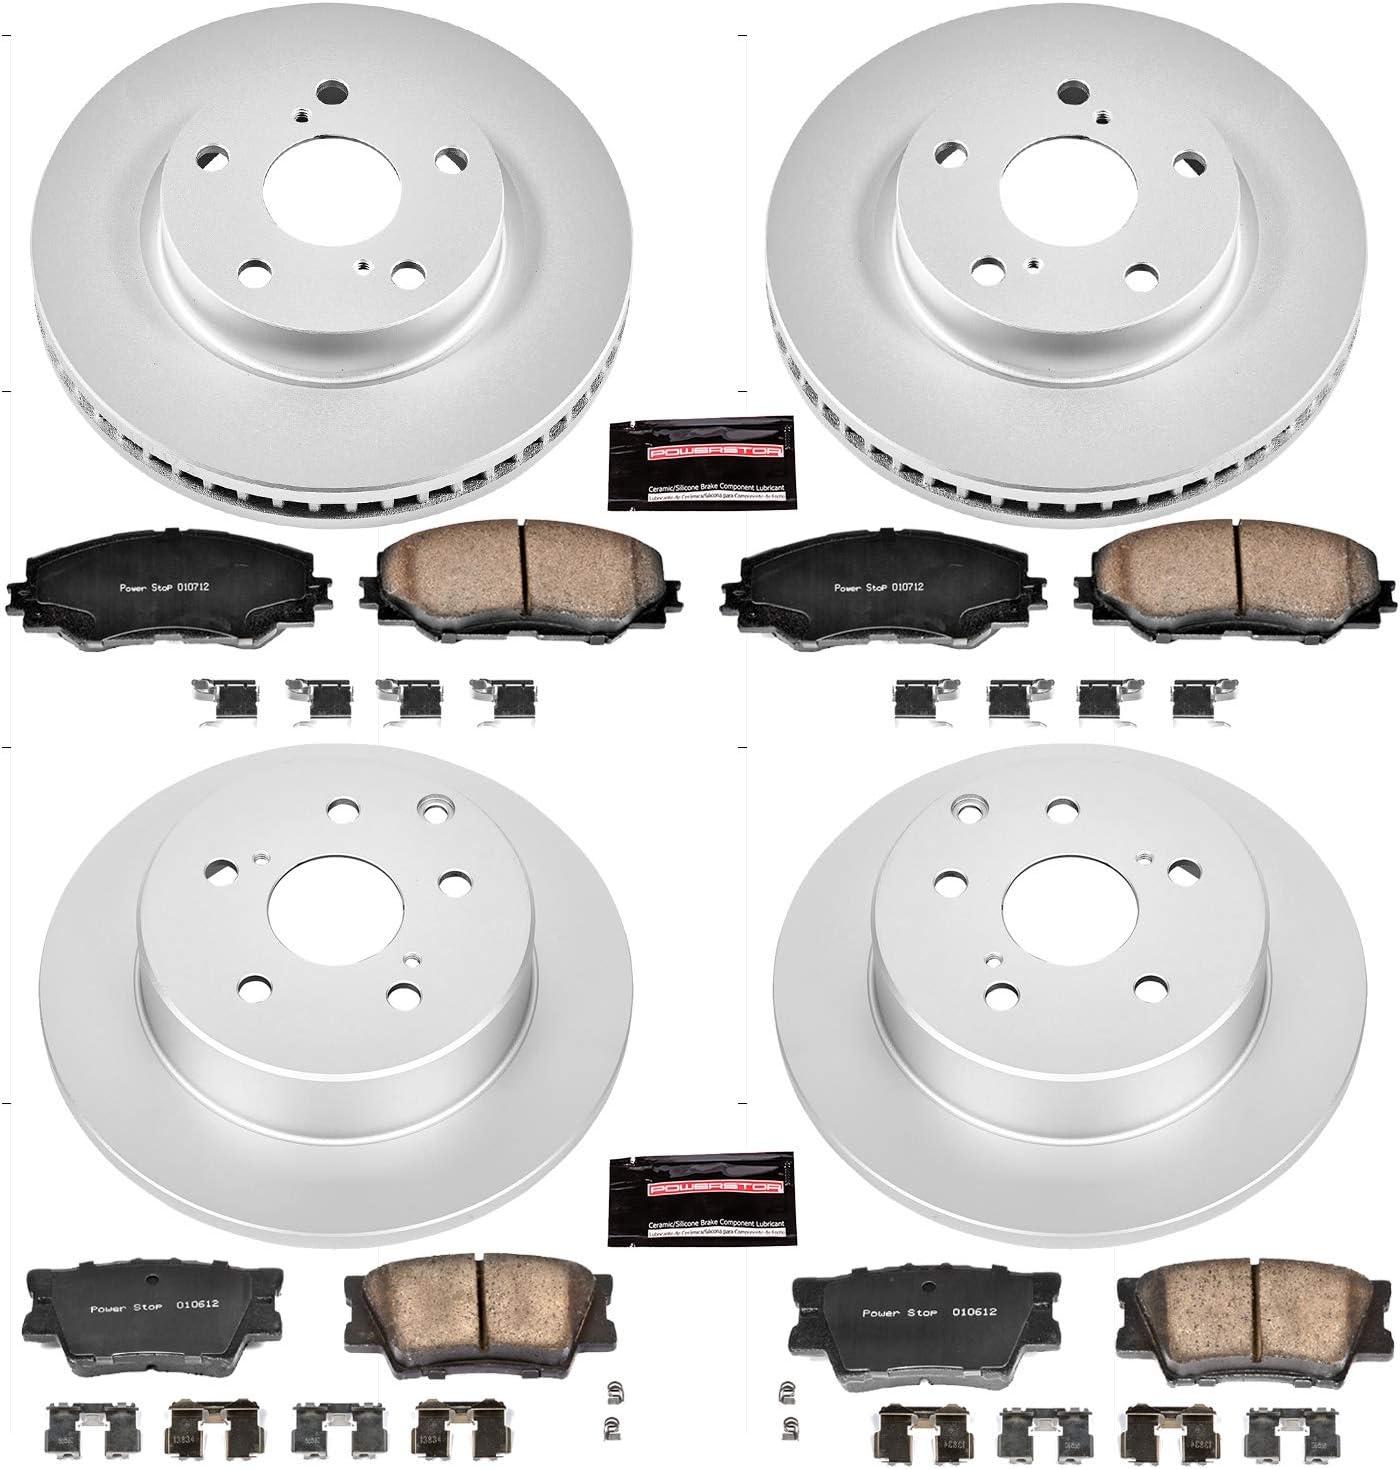 Power Stop CRK5800 front and rear Z23 Evolution Geomet Coated Brake Kit